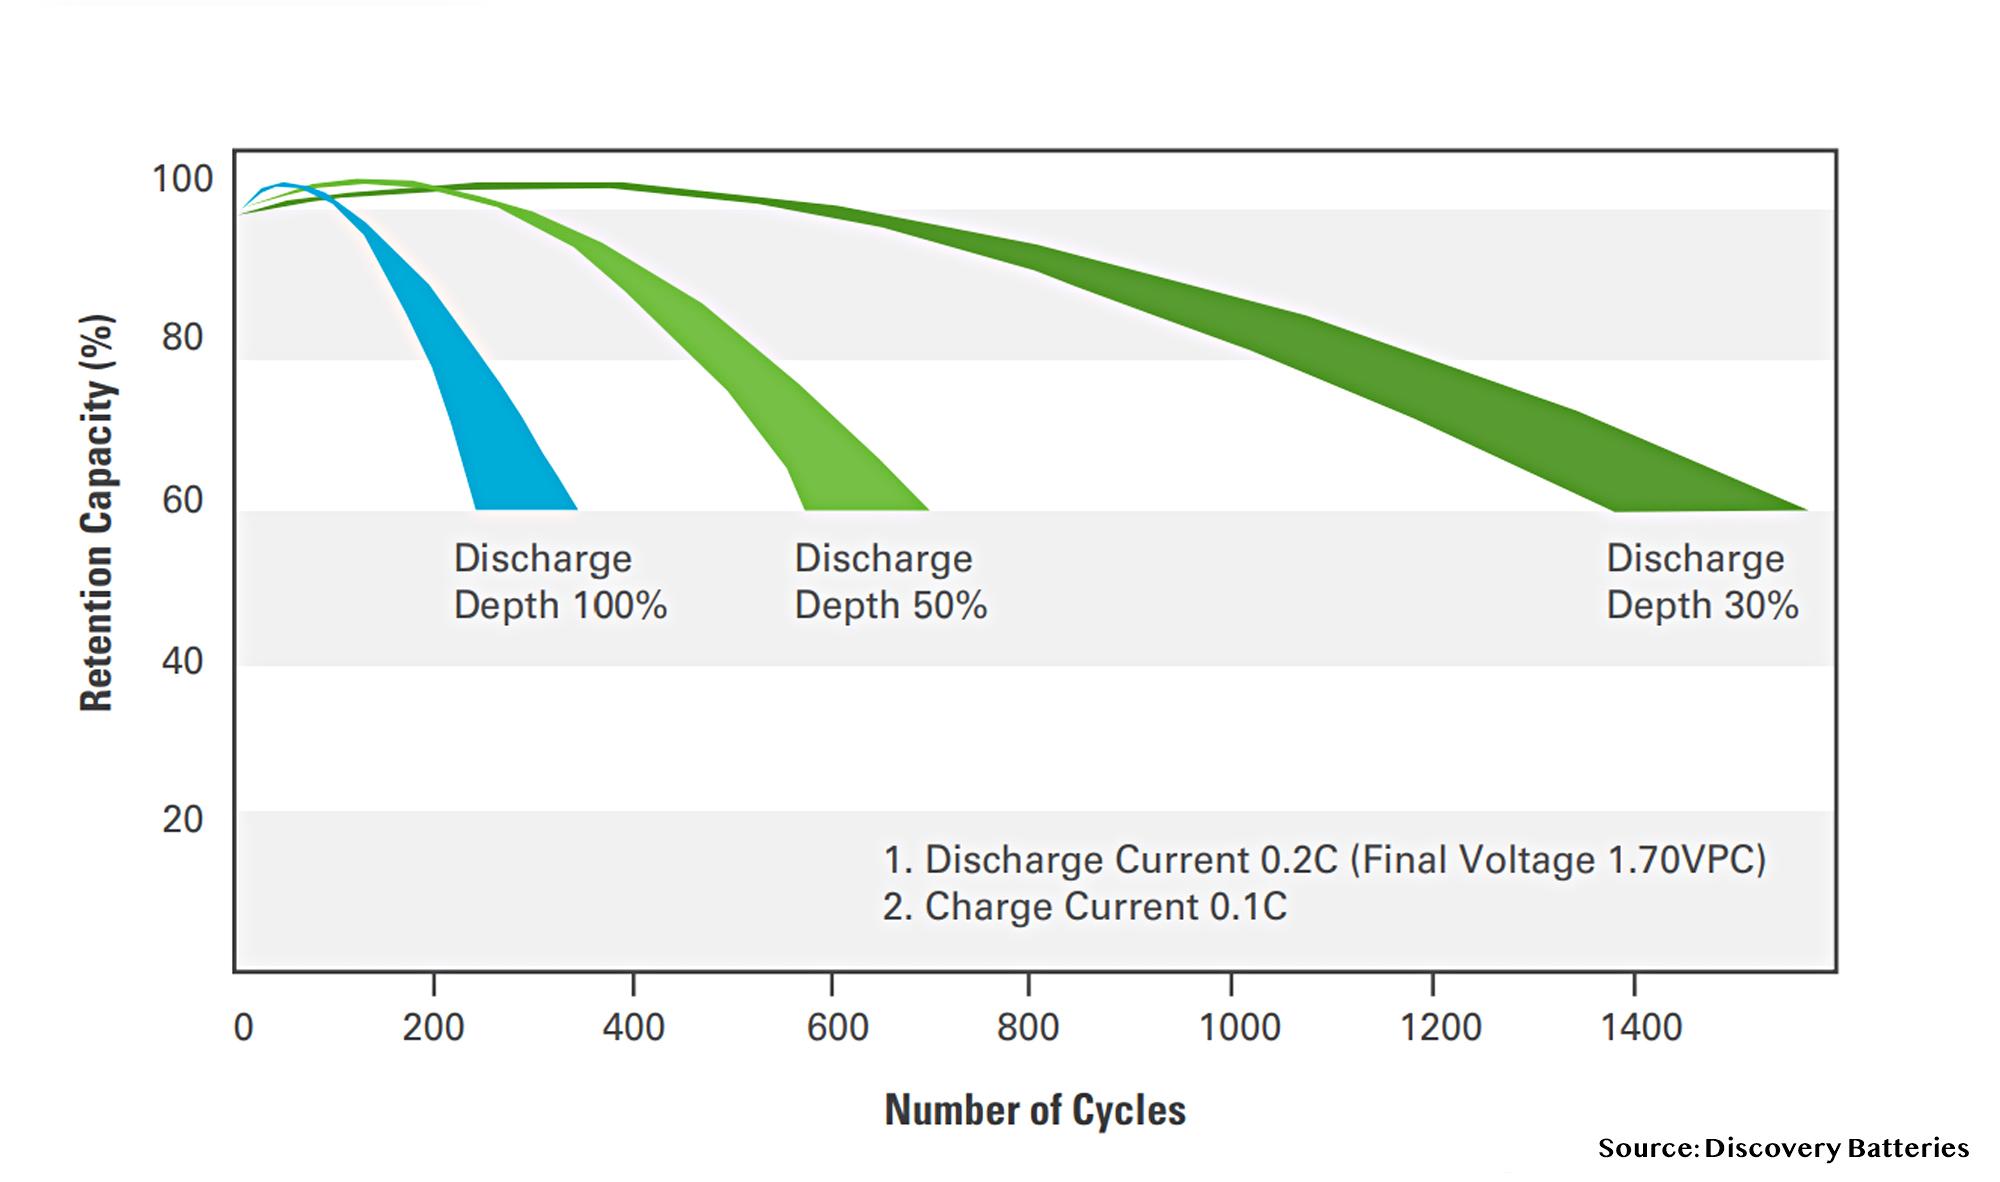 Springer Series Topic 1 Batteries 6